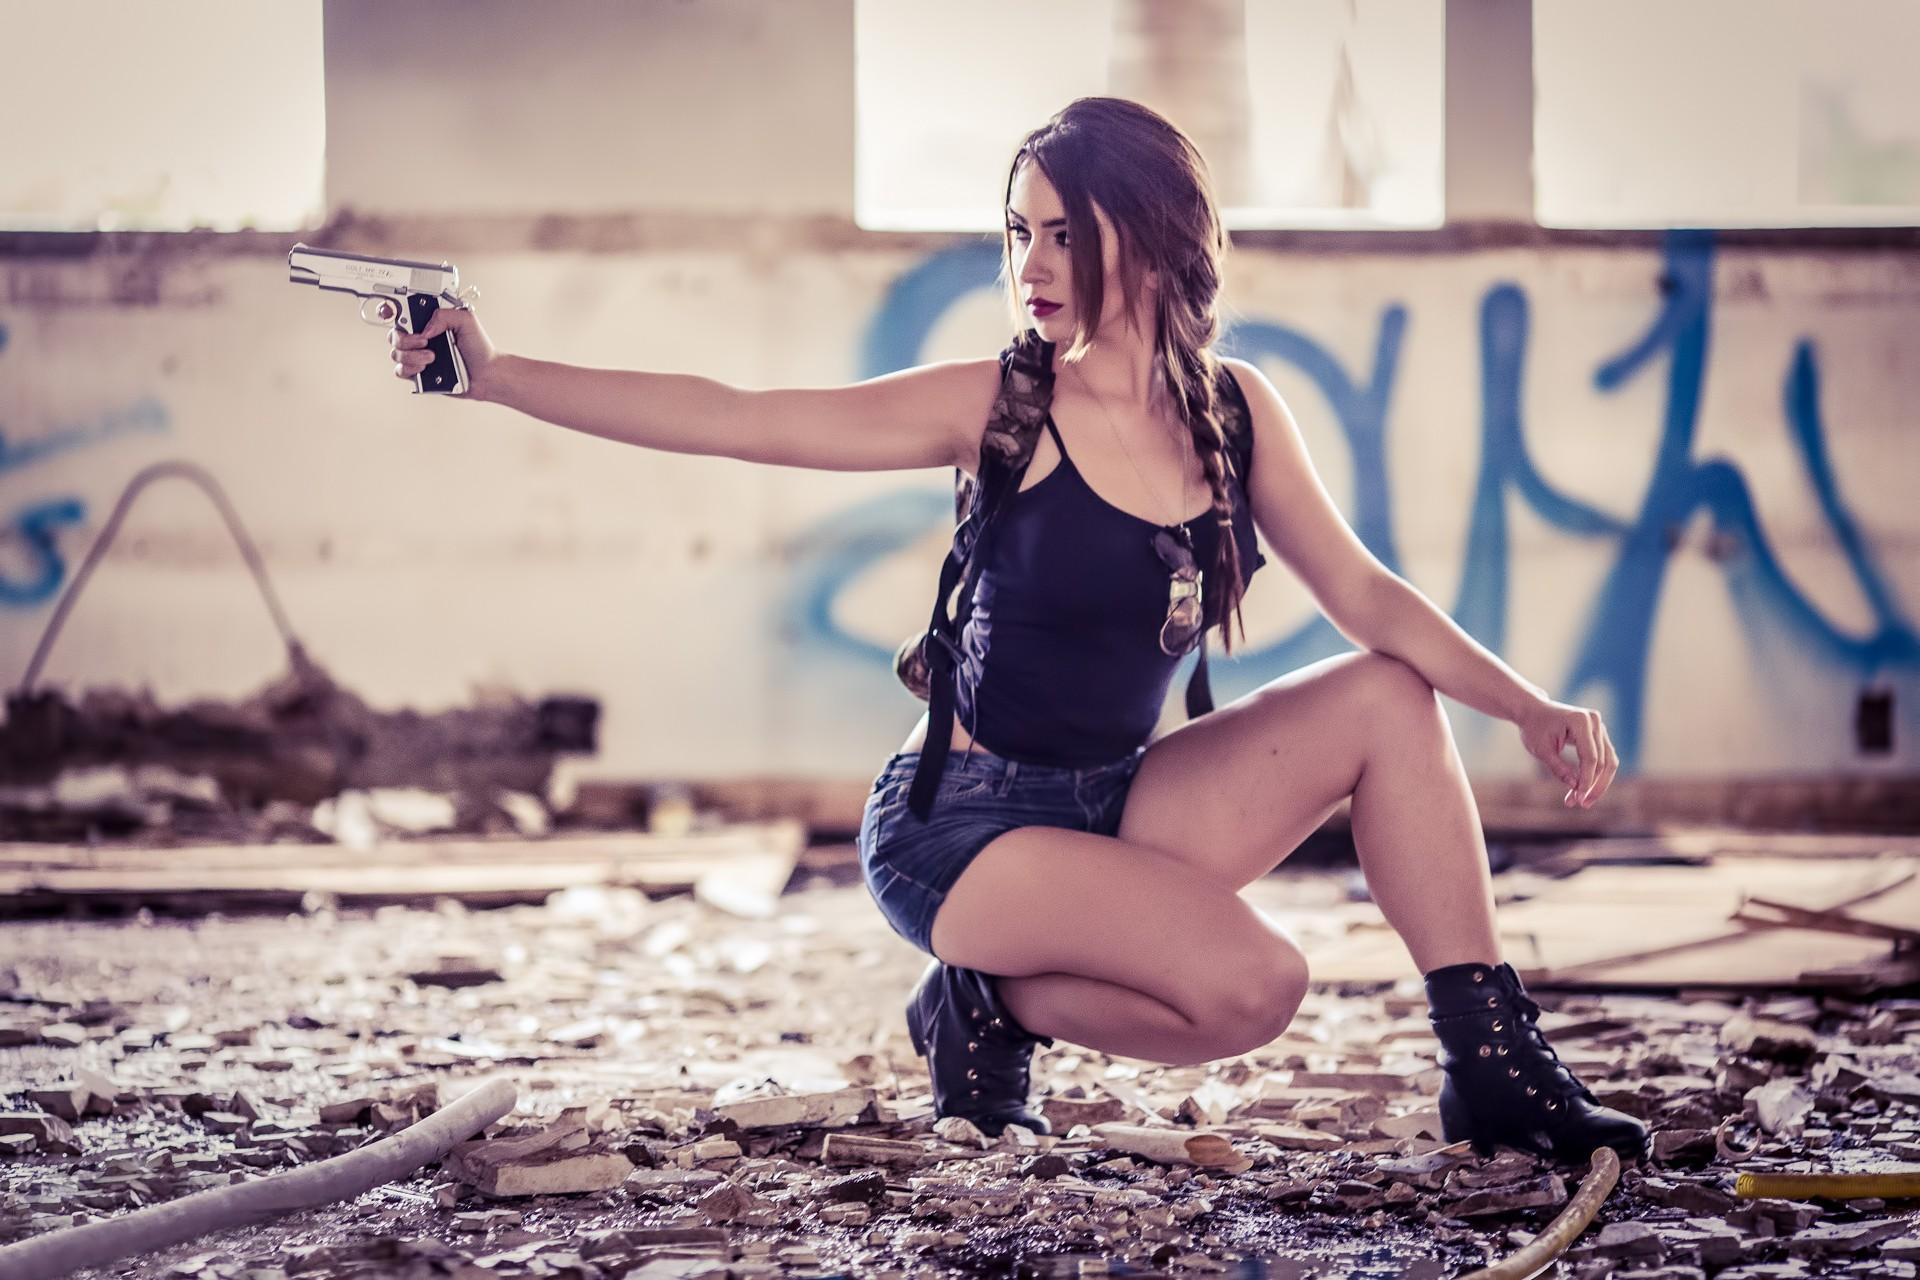 Sarath Arts: 35 Best Sexy Girls HD Wallpapers